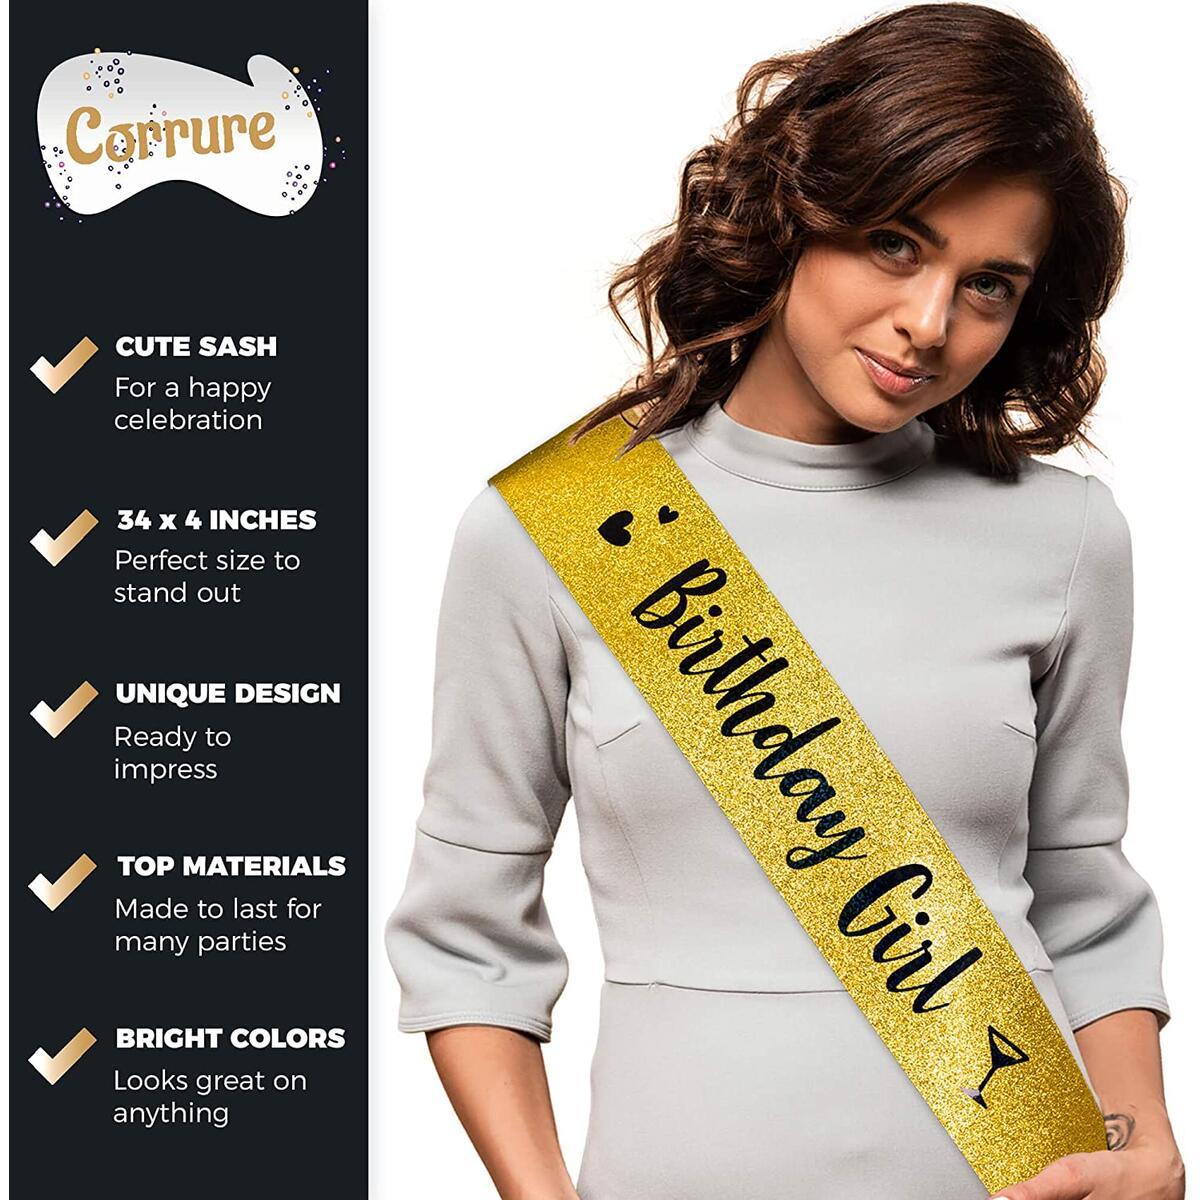 CORRURE 'Birthday Girl' Glitter Sash with Metallic Black Foil - Gold Glitter Birthday Sash for Women